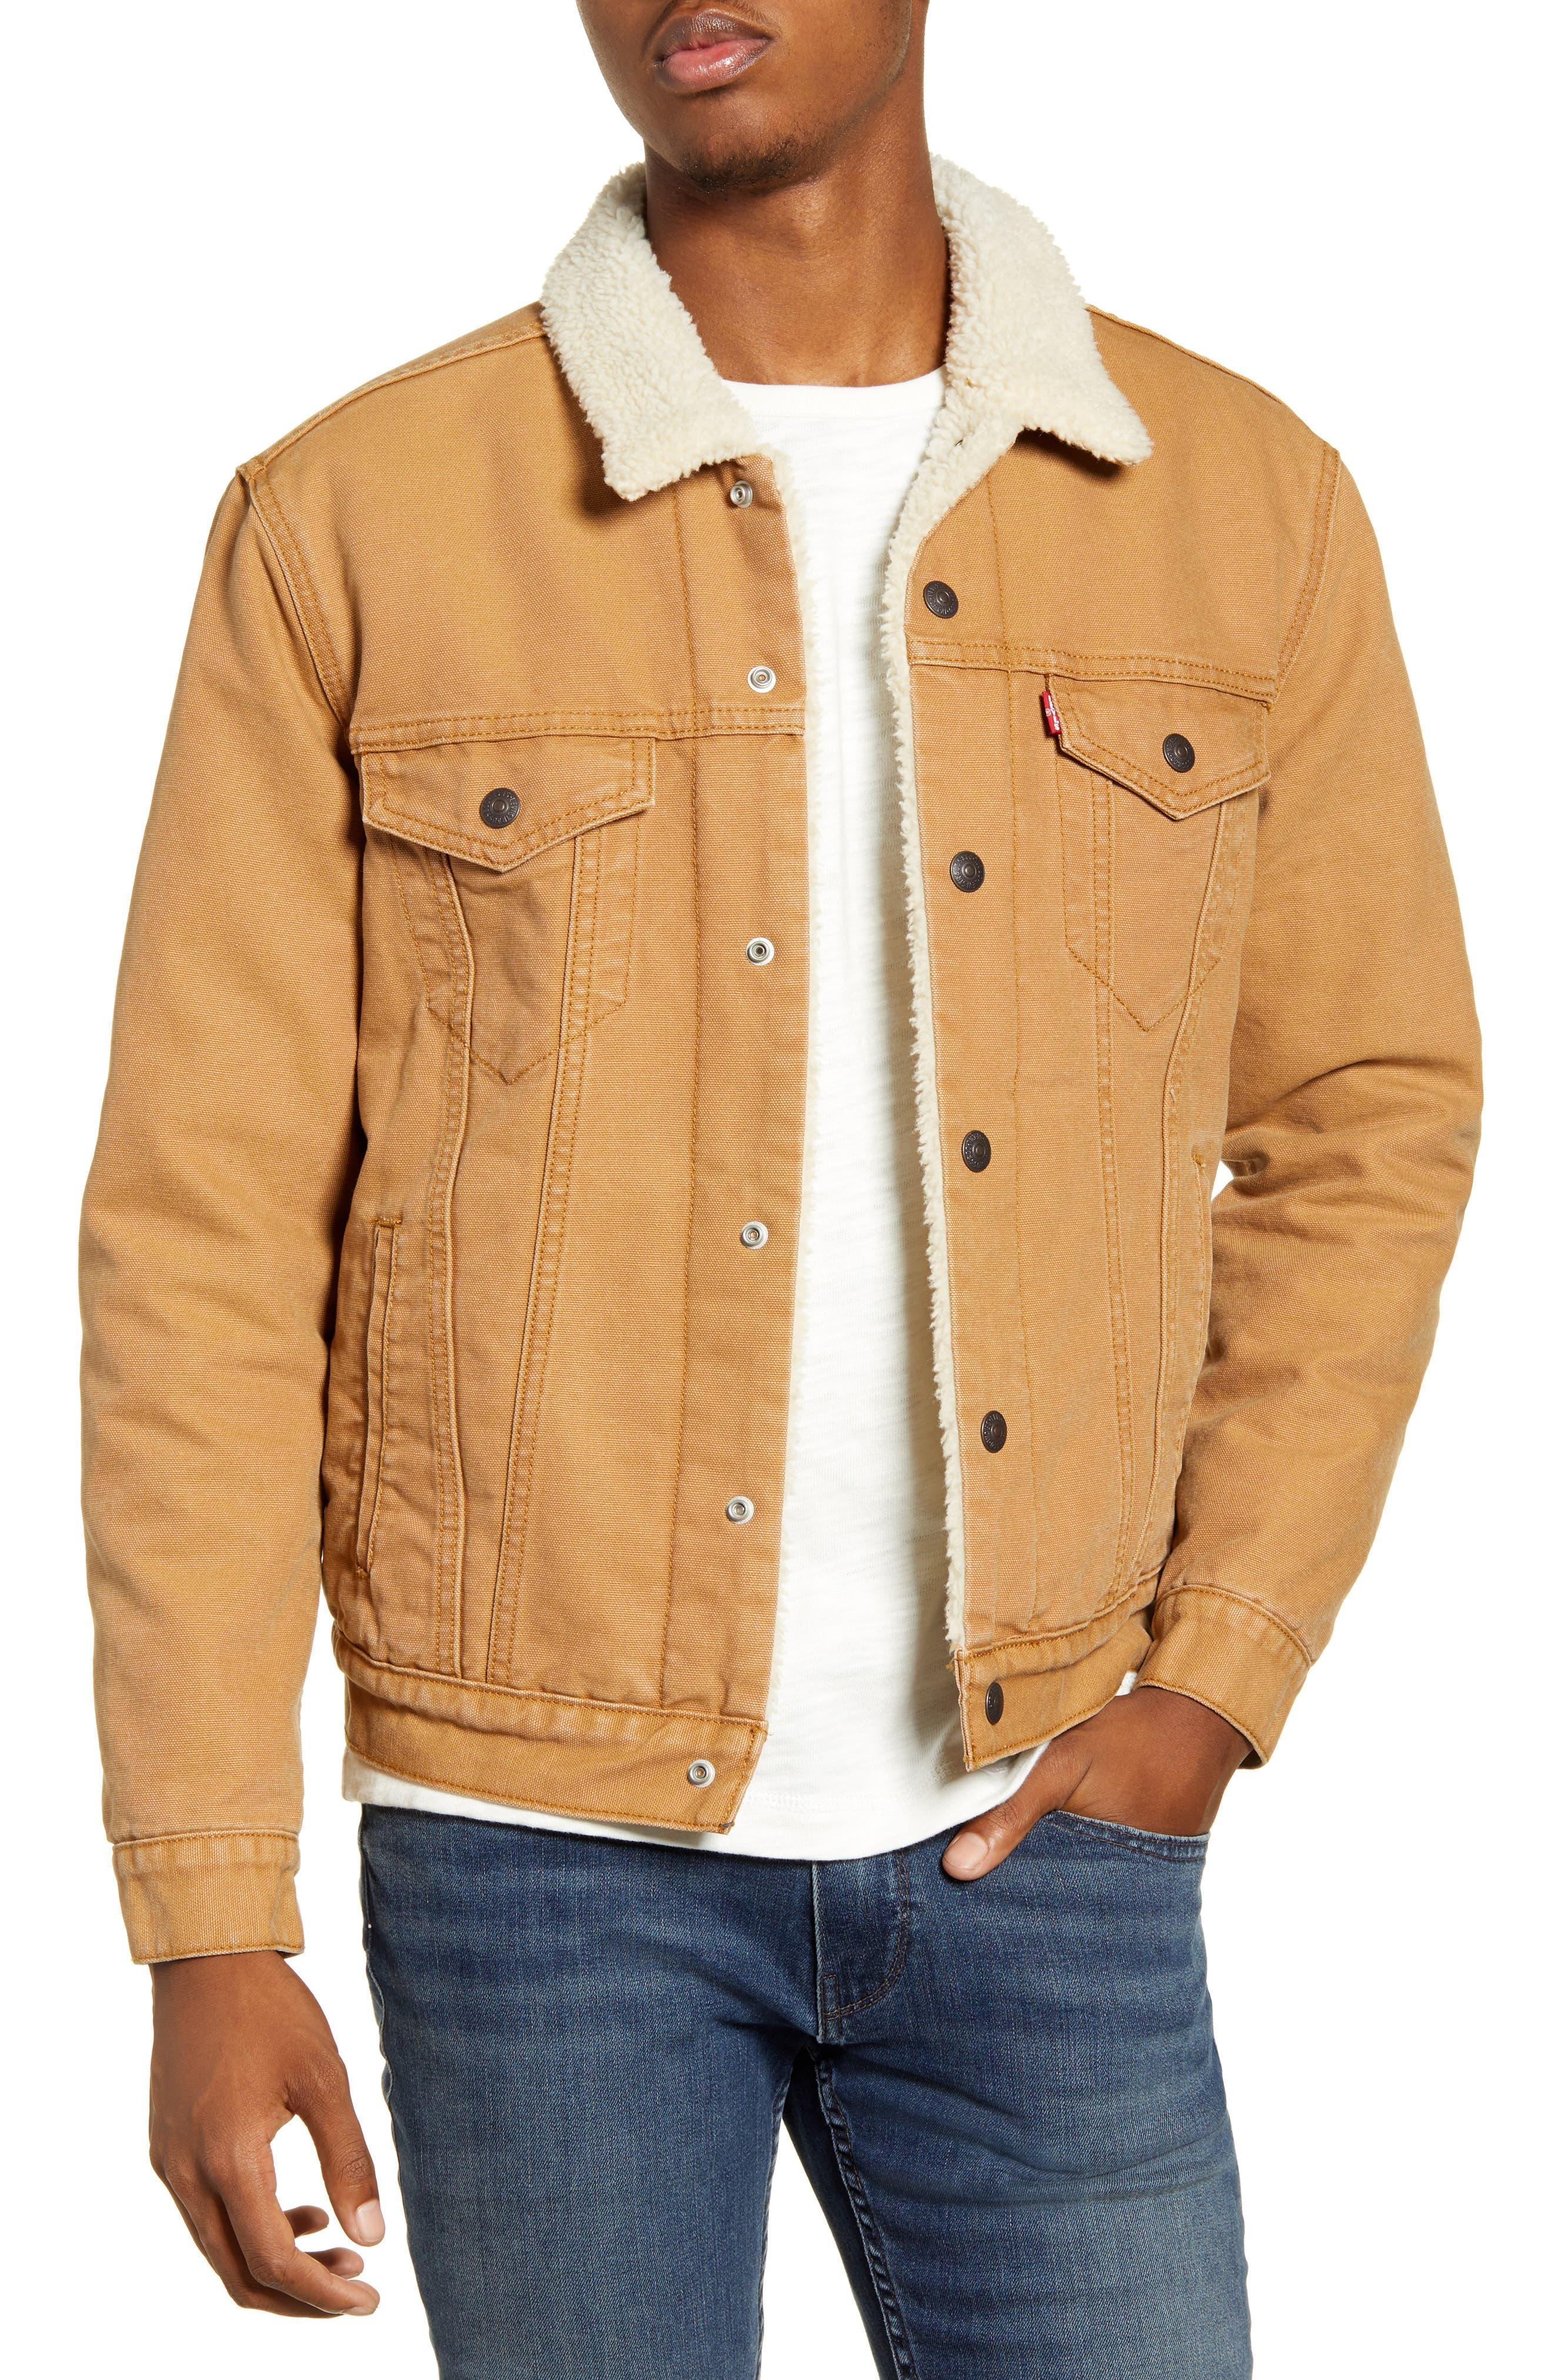 70s Jackets & Hippie Vests, Ponchos Mens Levis Type Iii Fleece Lined Denim Trucker Jacket $128.00 AT vintagedancer.com